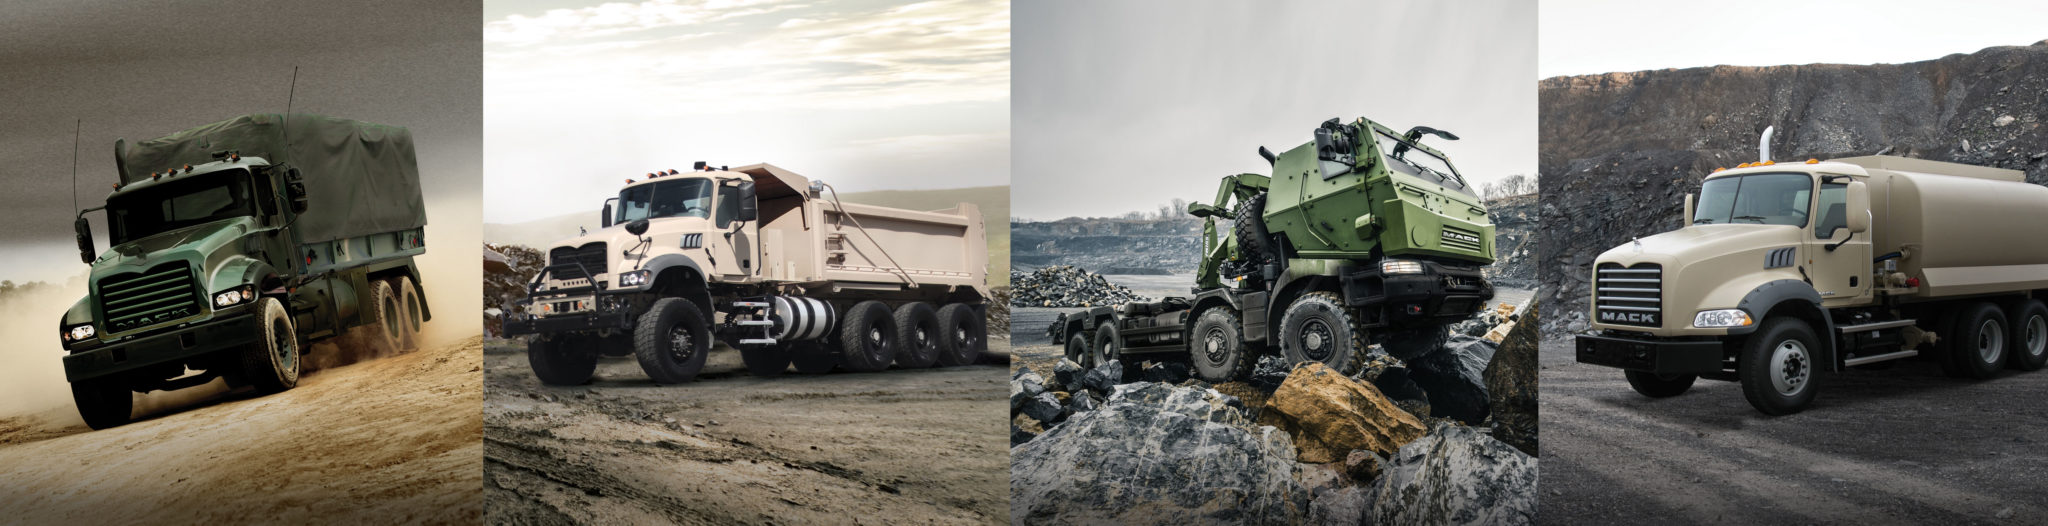 Mack-Defense-Products